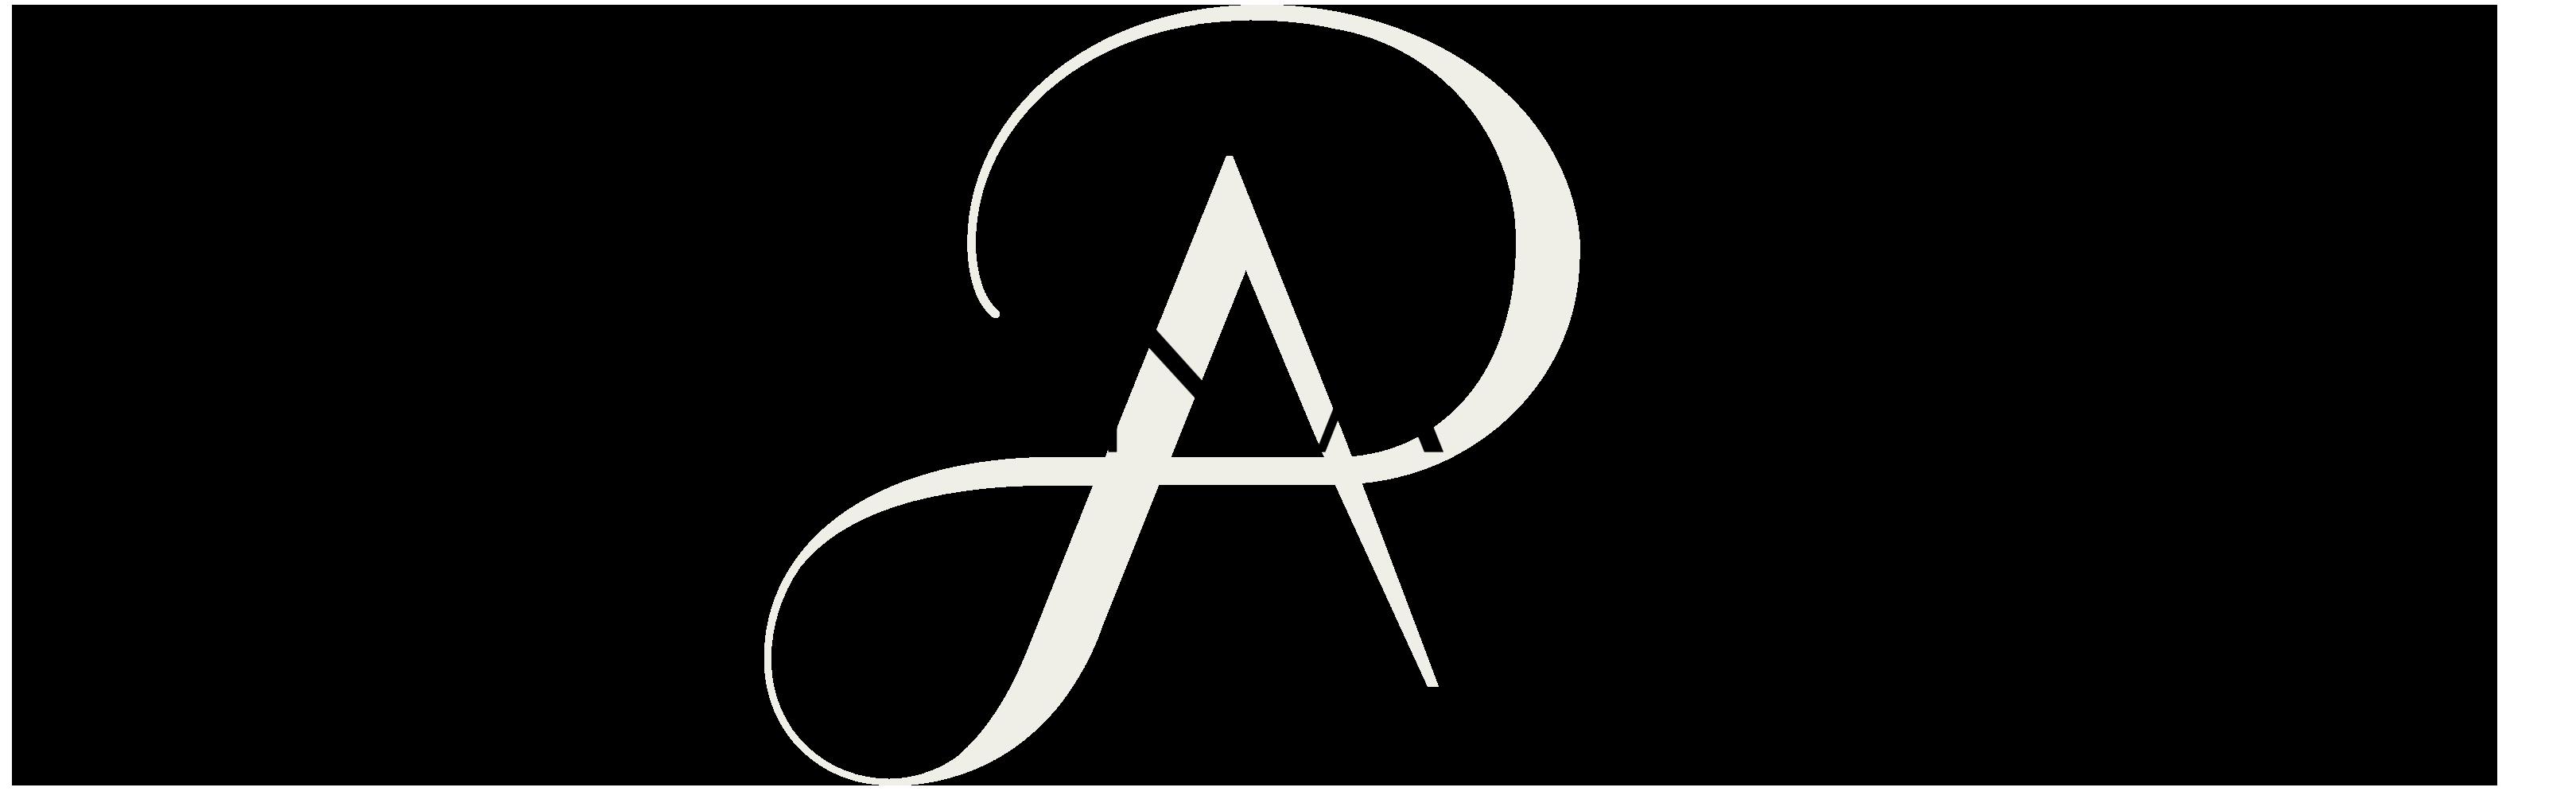 Adrianna_Papell_logo_logotype